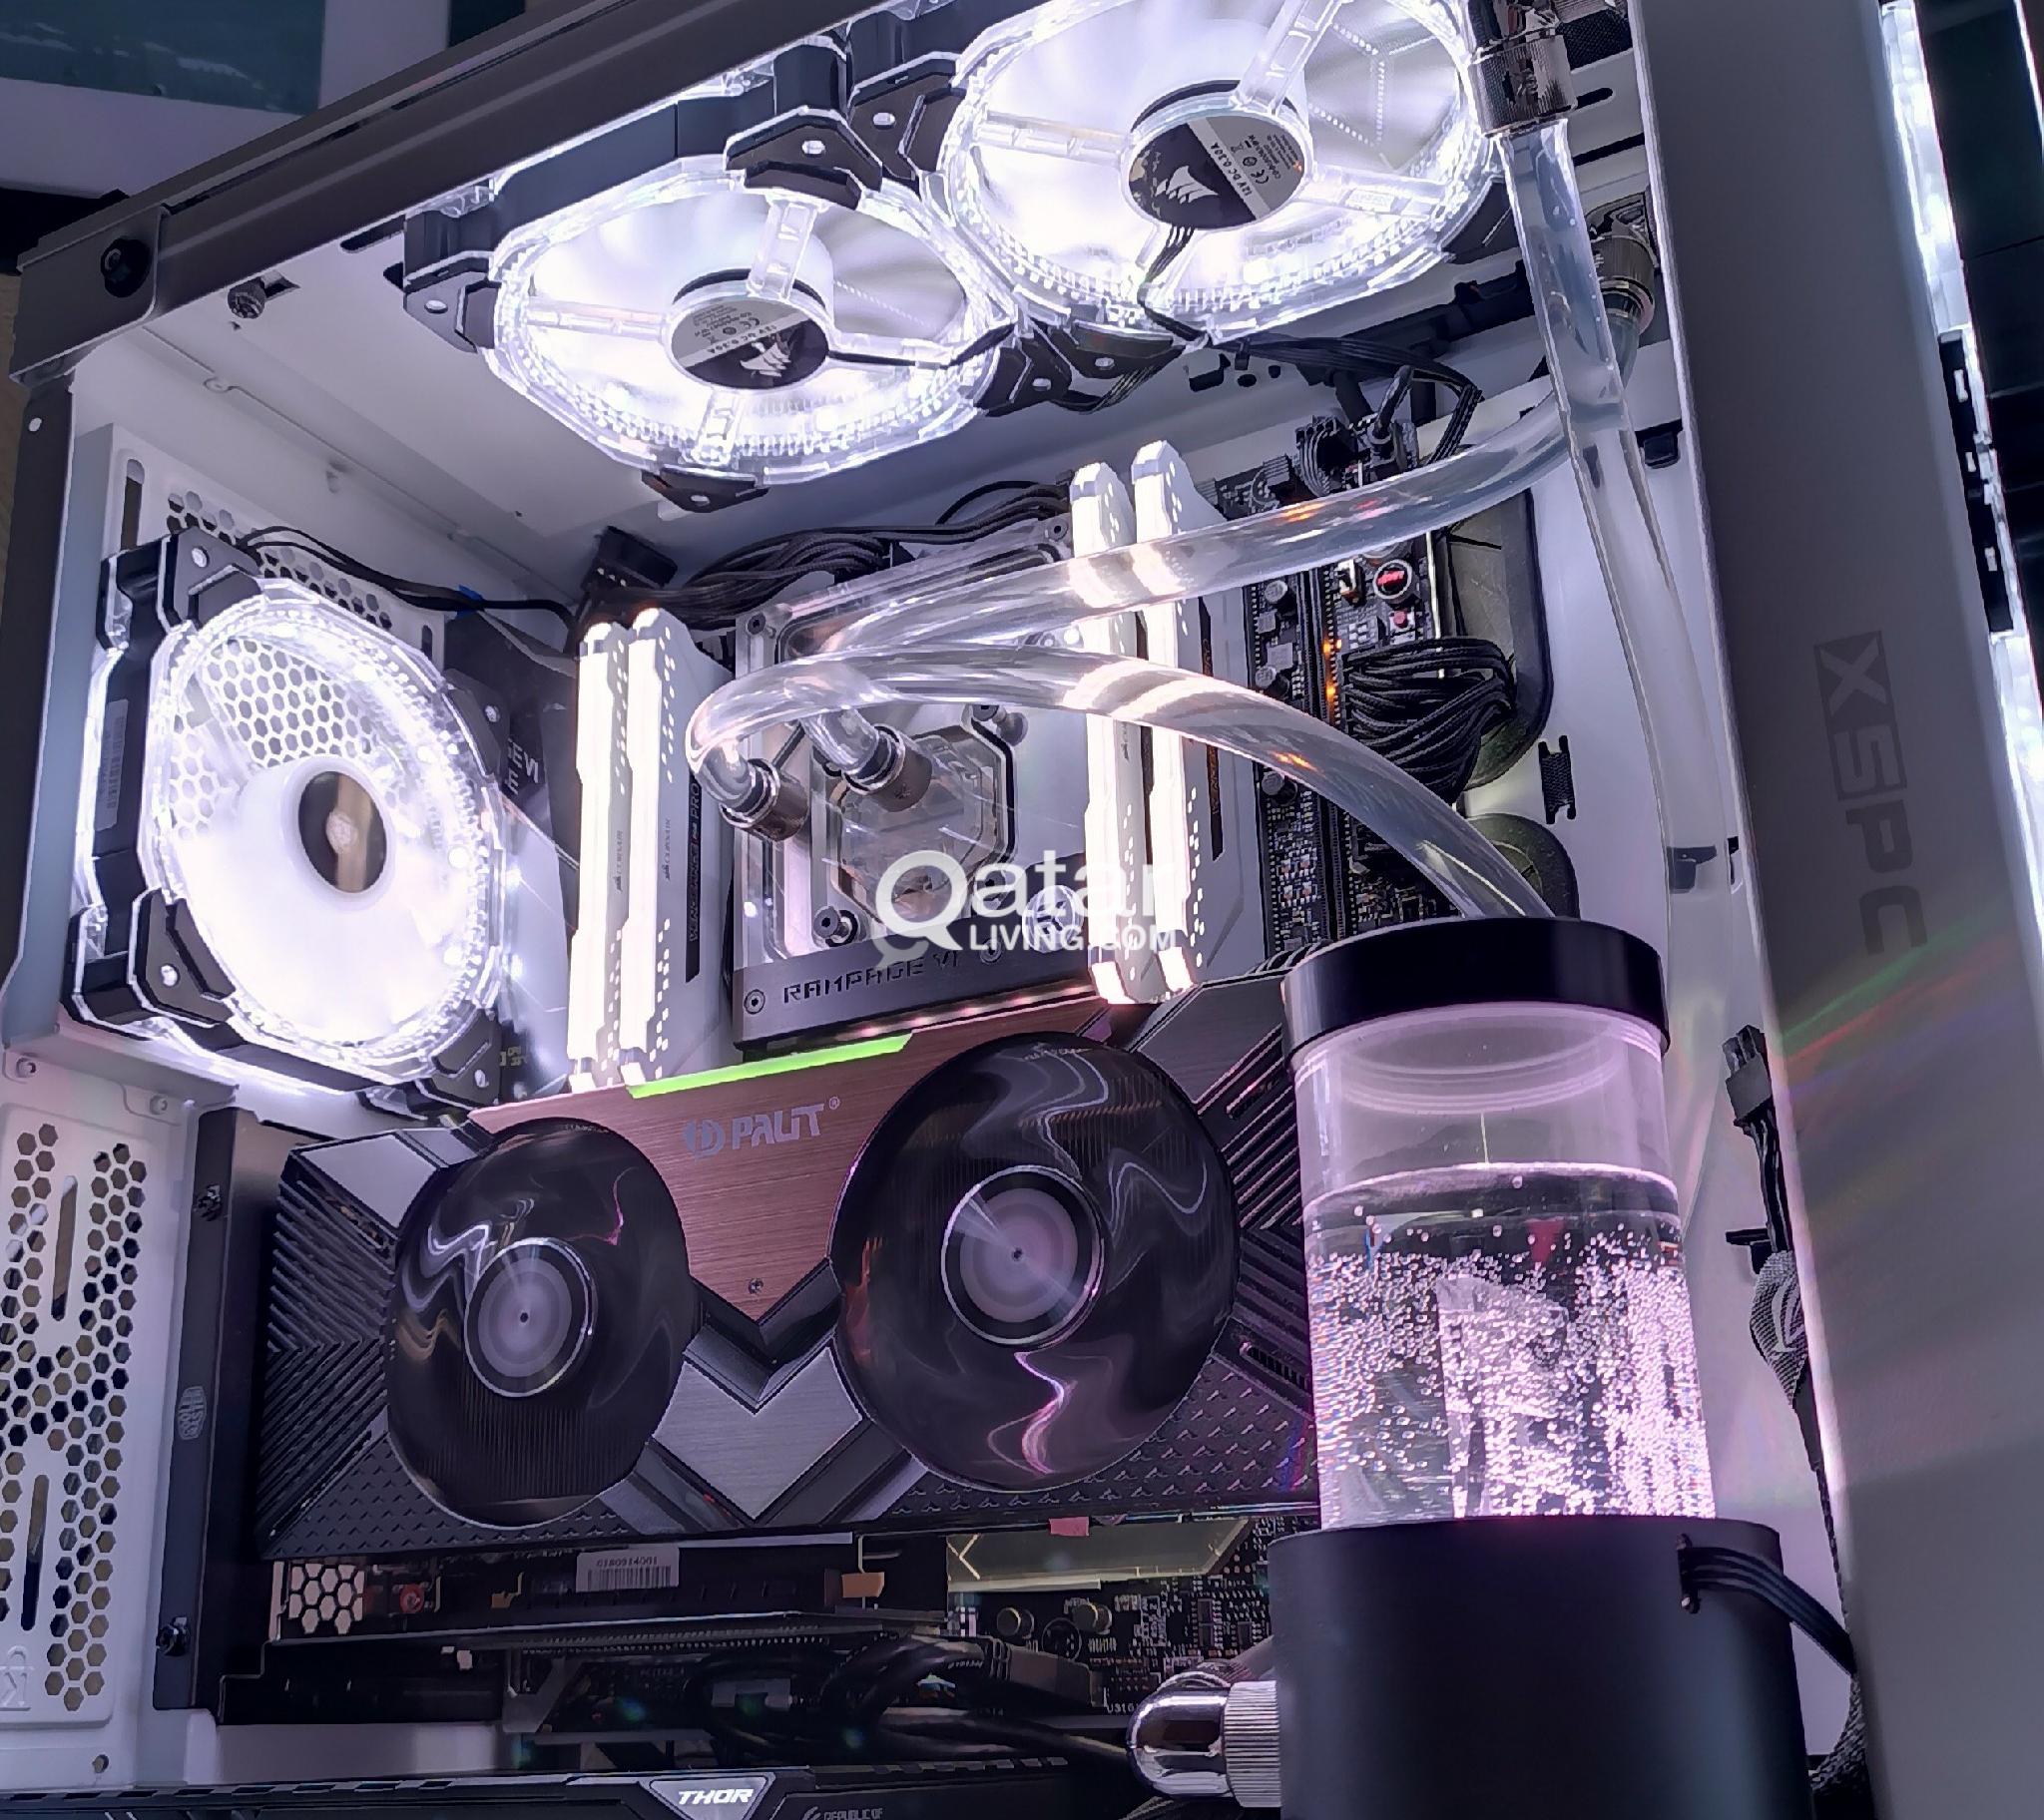 Nvidia RTX 2080 ti + PC case w/ workstation parts   Qatar Living